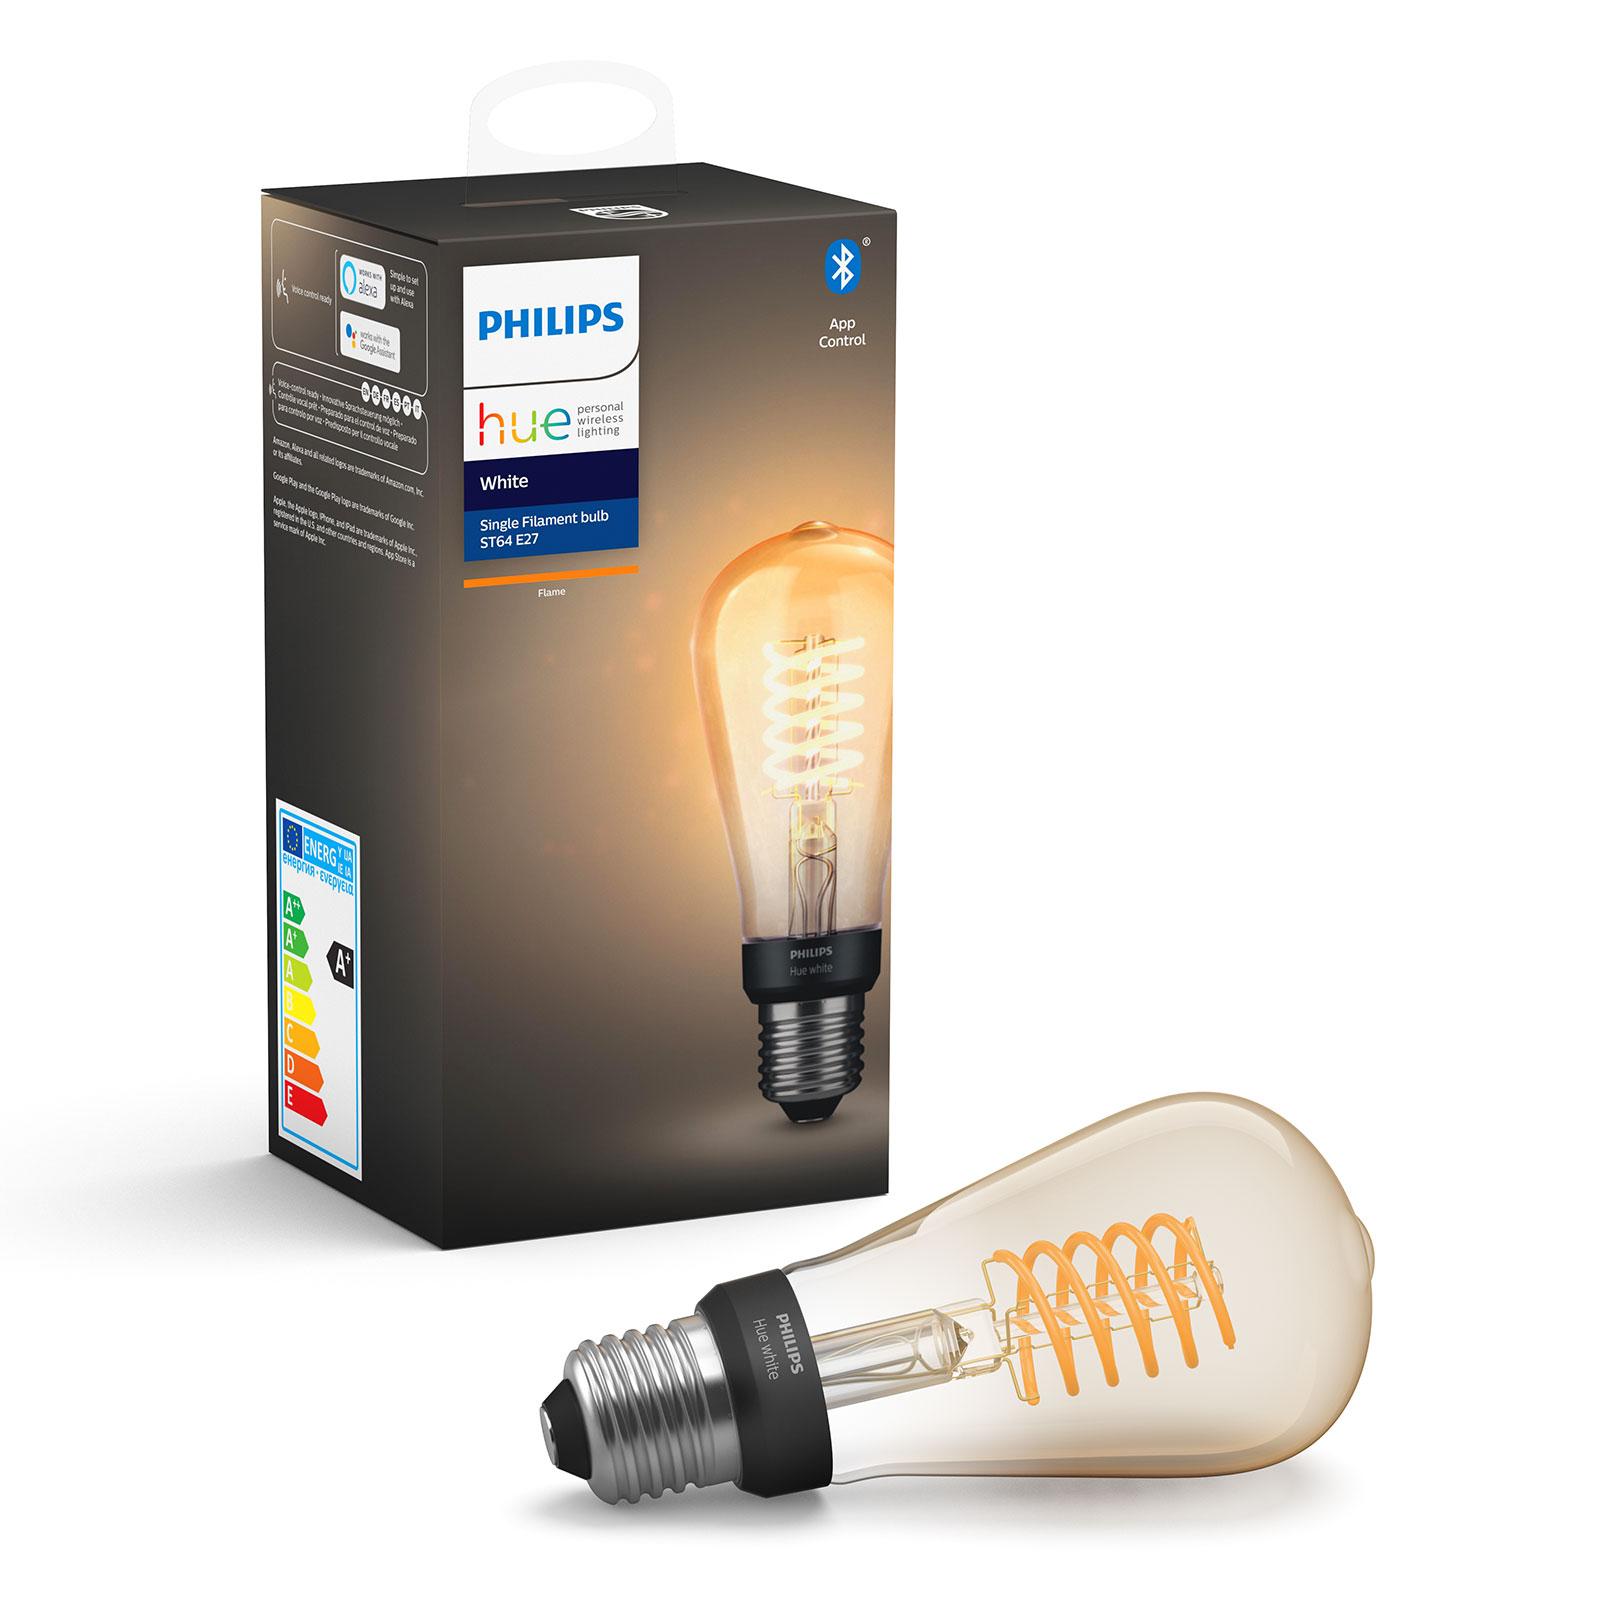 Philips Hue White E27 LED a filamenti rustica ST64